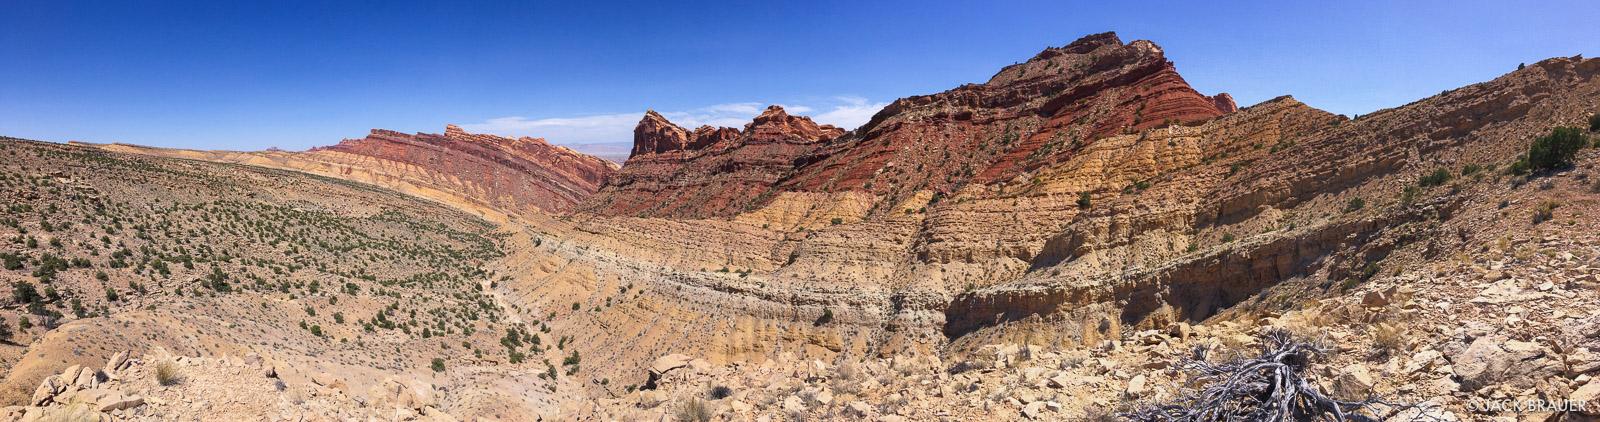 San Rafael Swell, Utah, panorama, photo